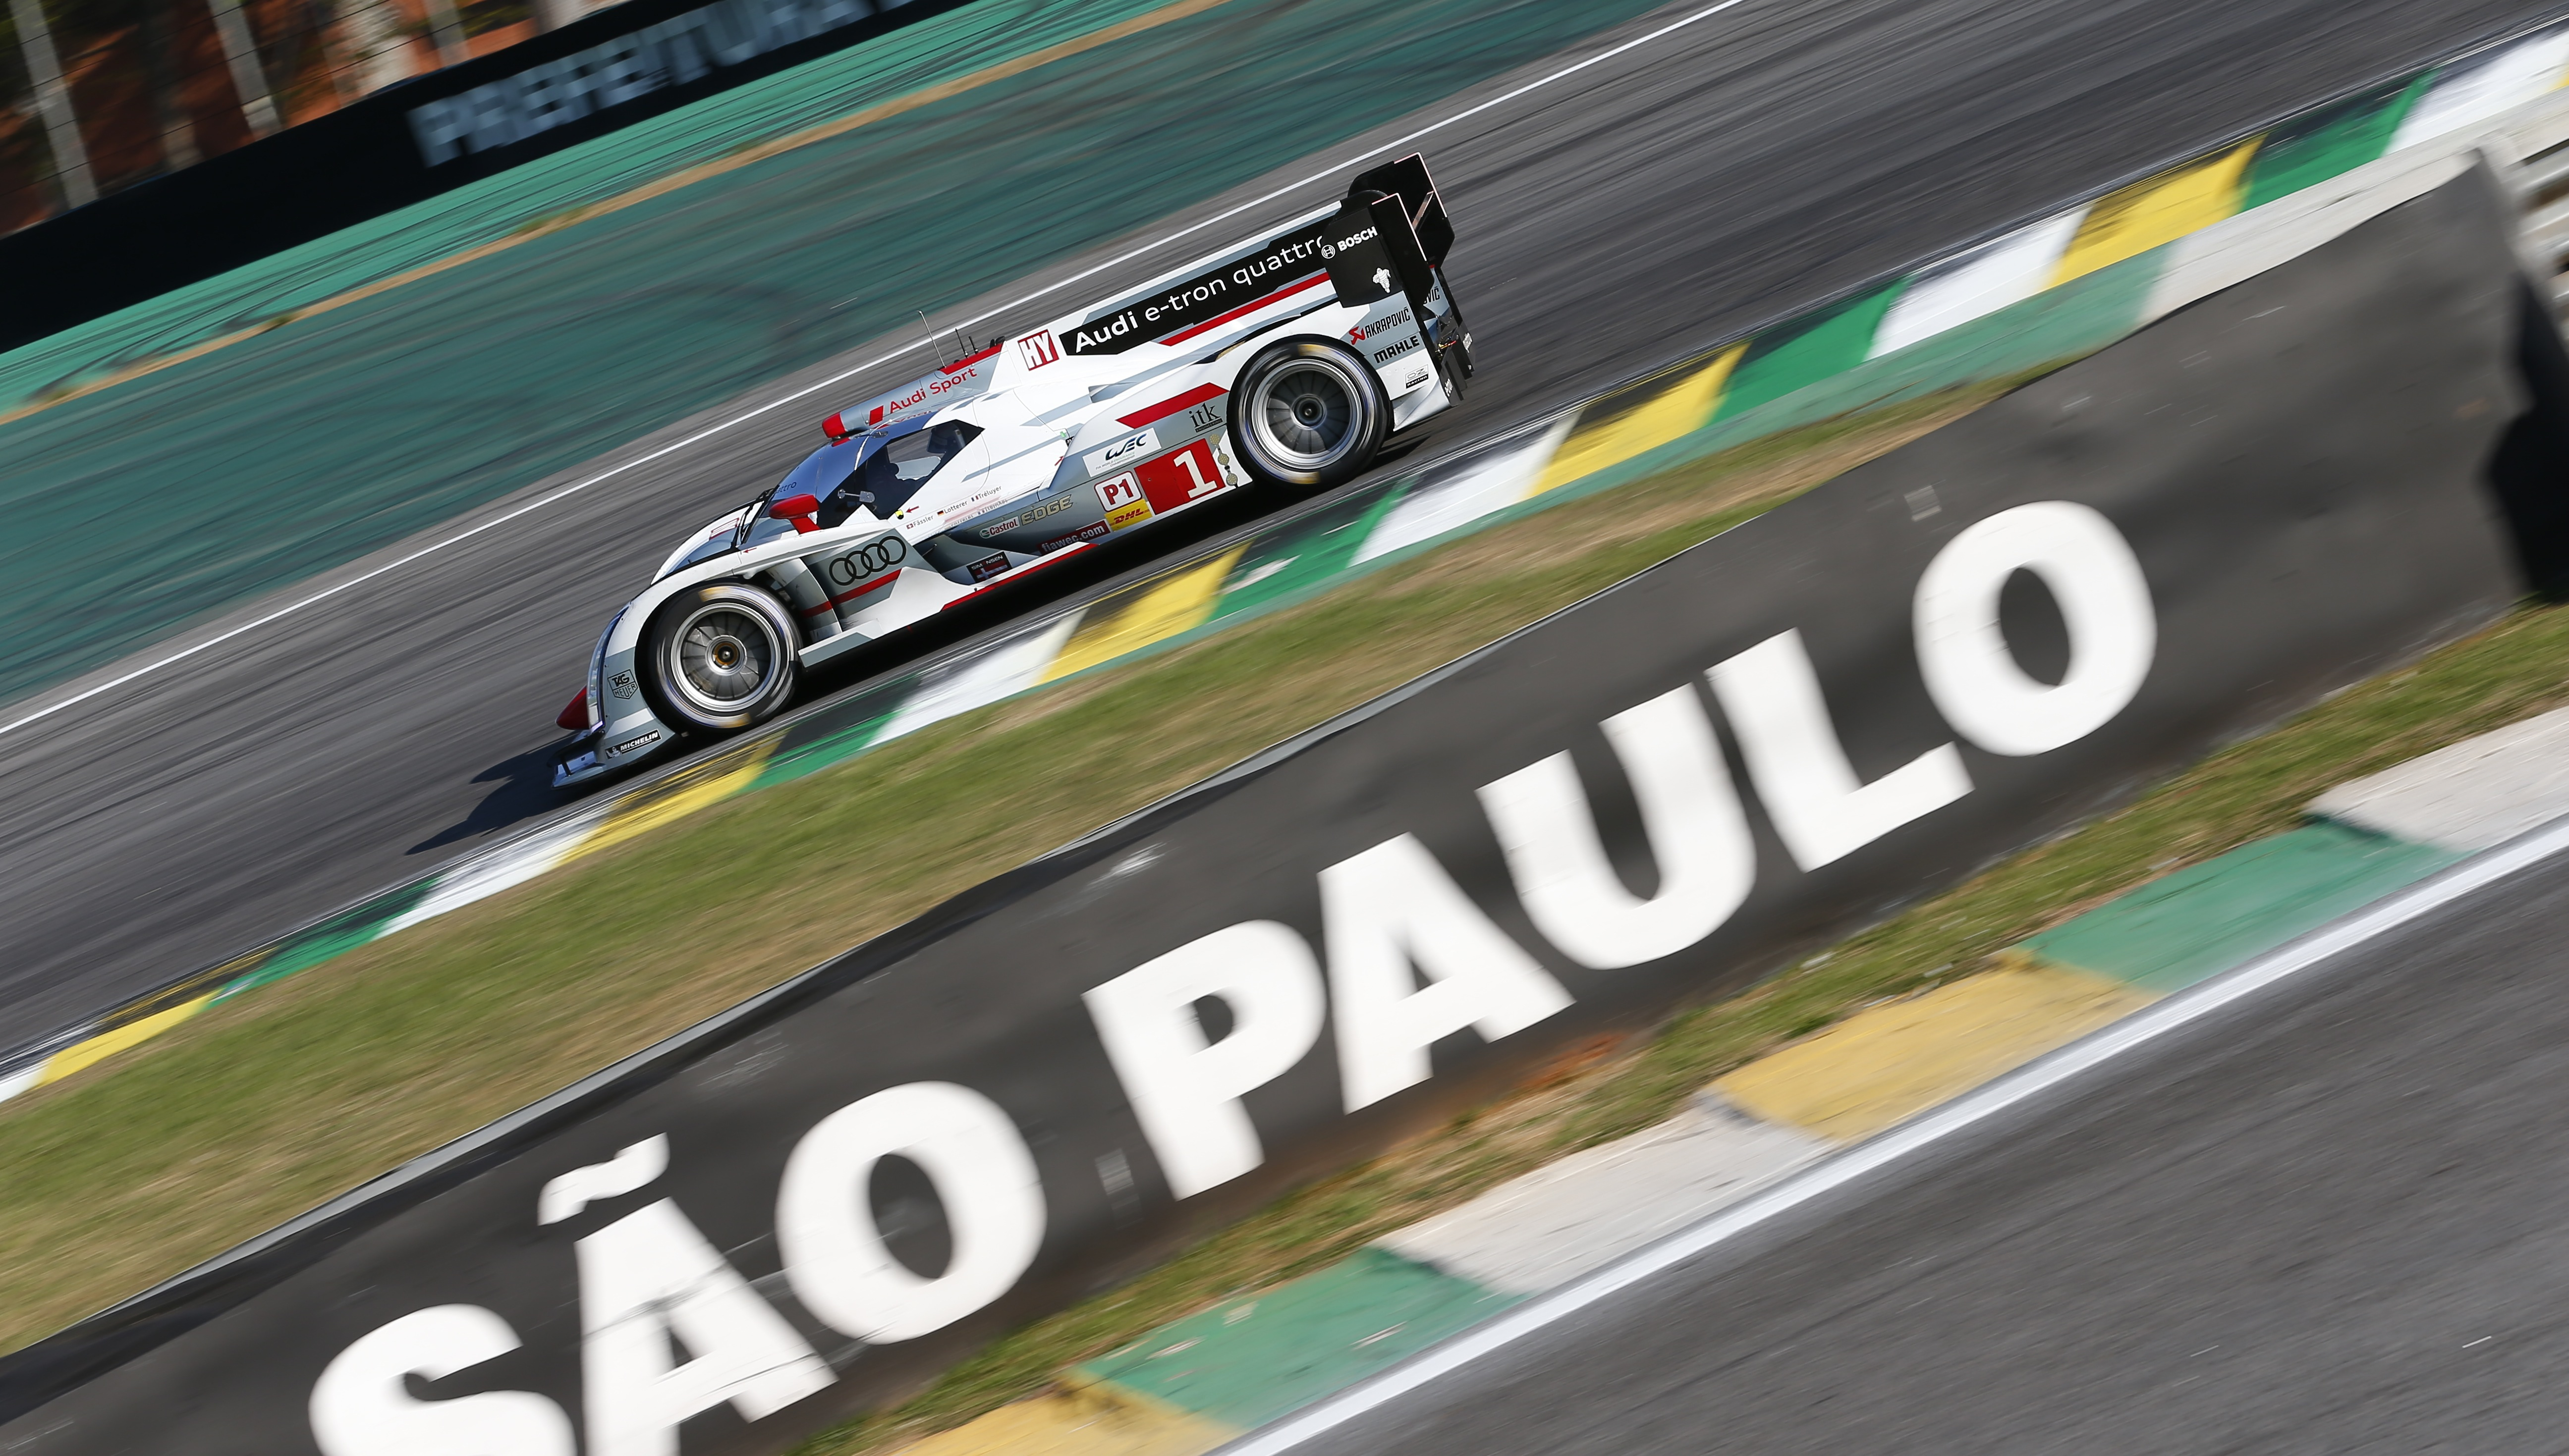 WEC 2013 - 6 Hours of Sao Paulo